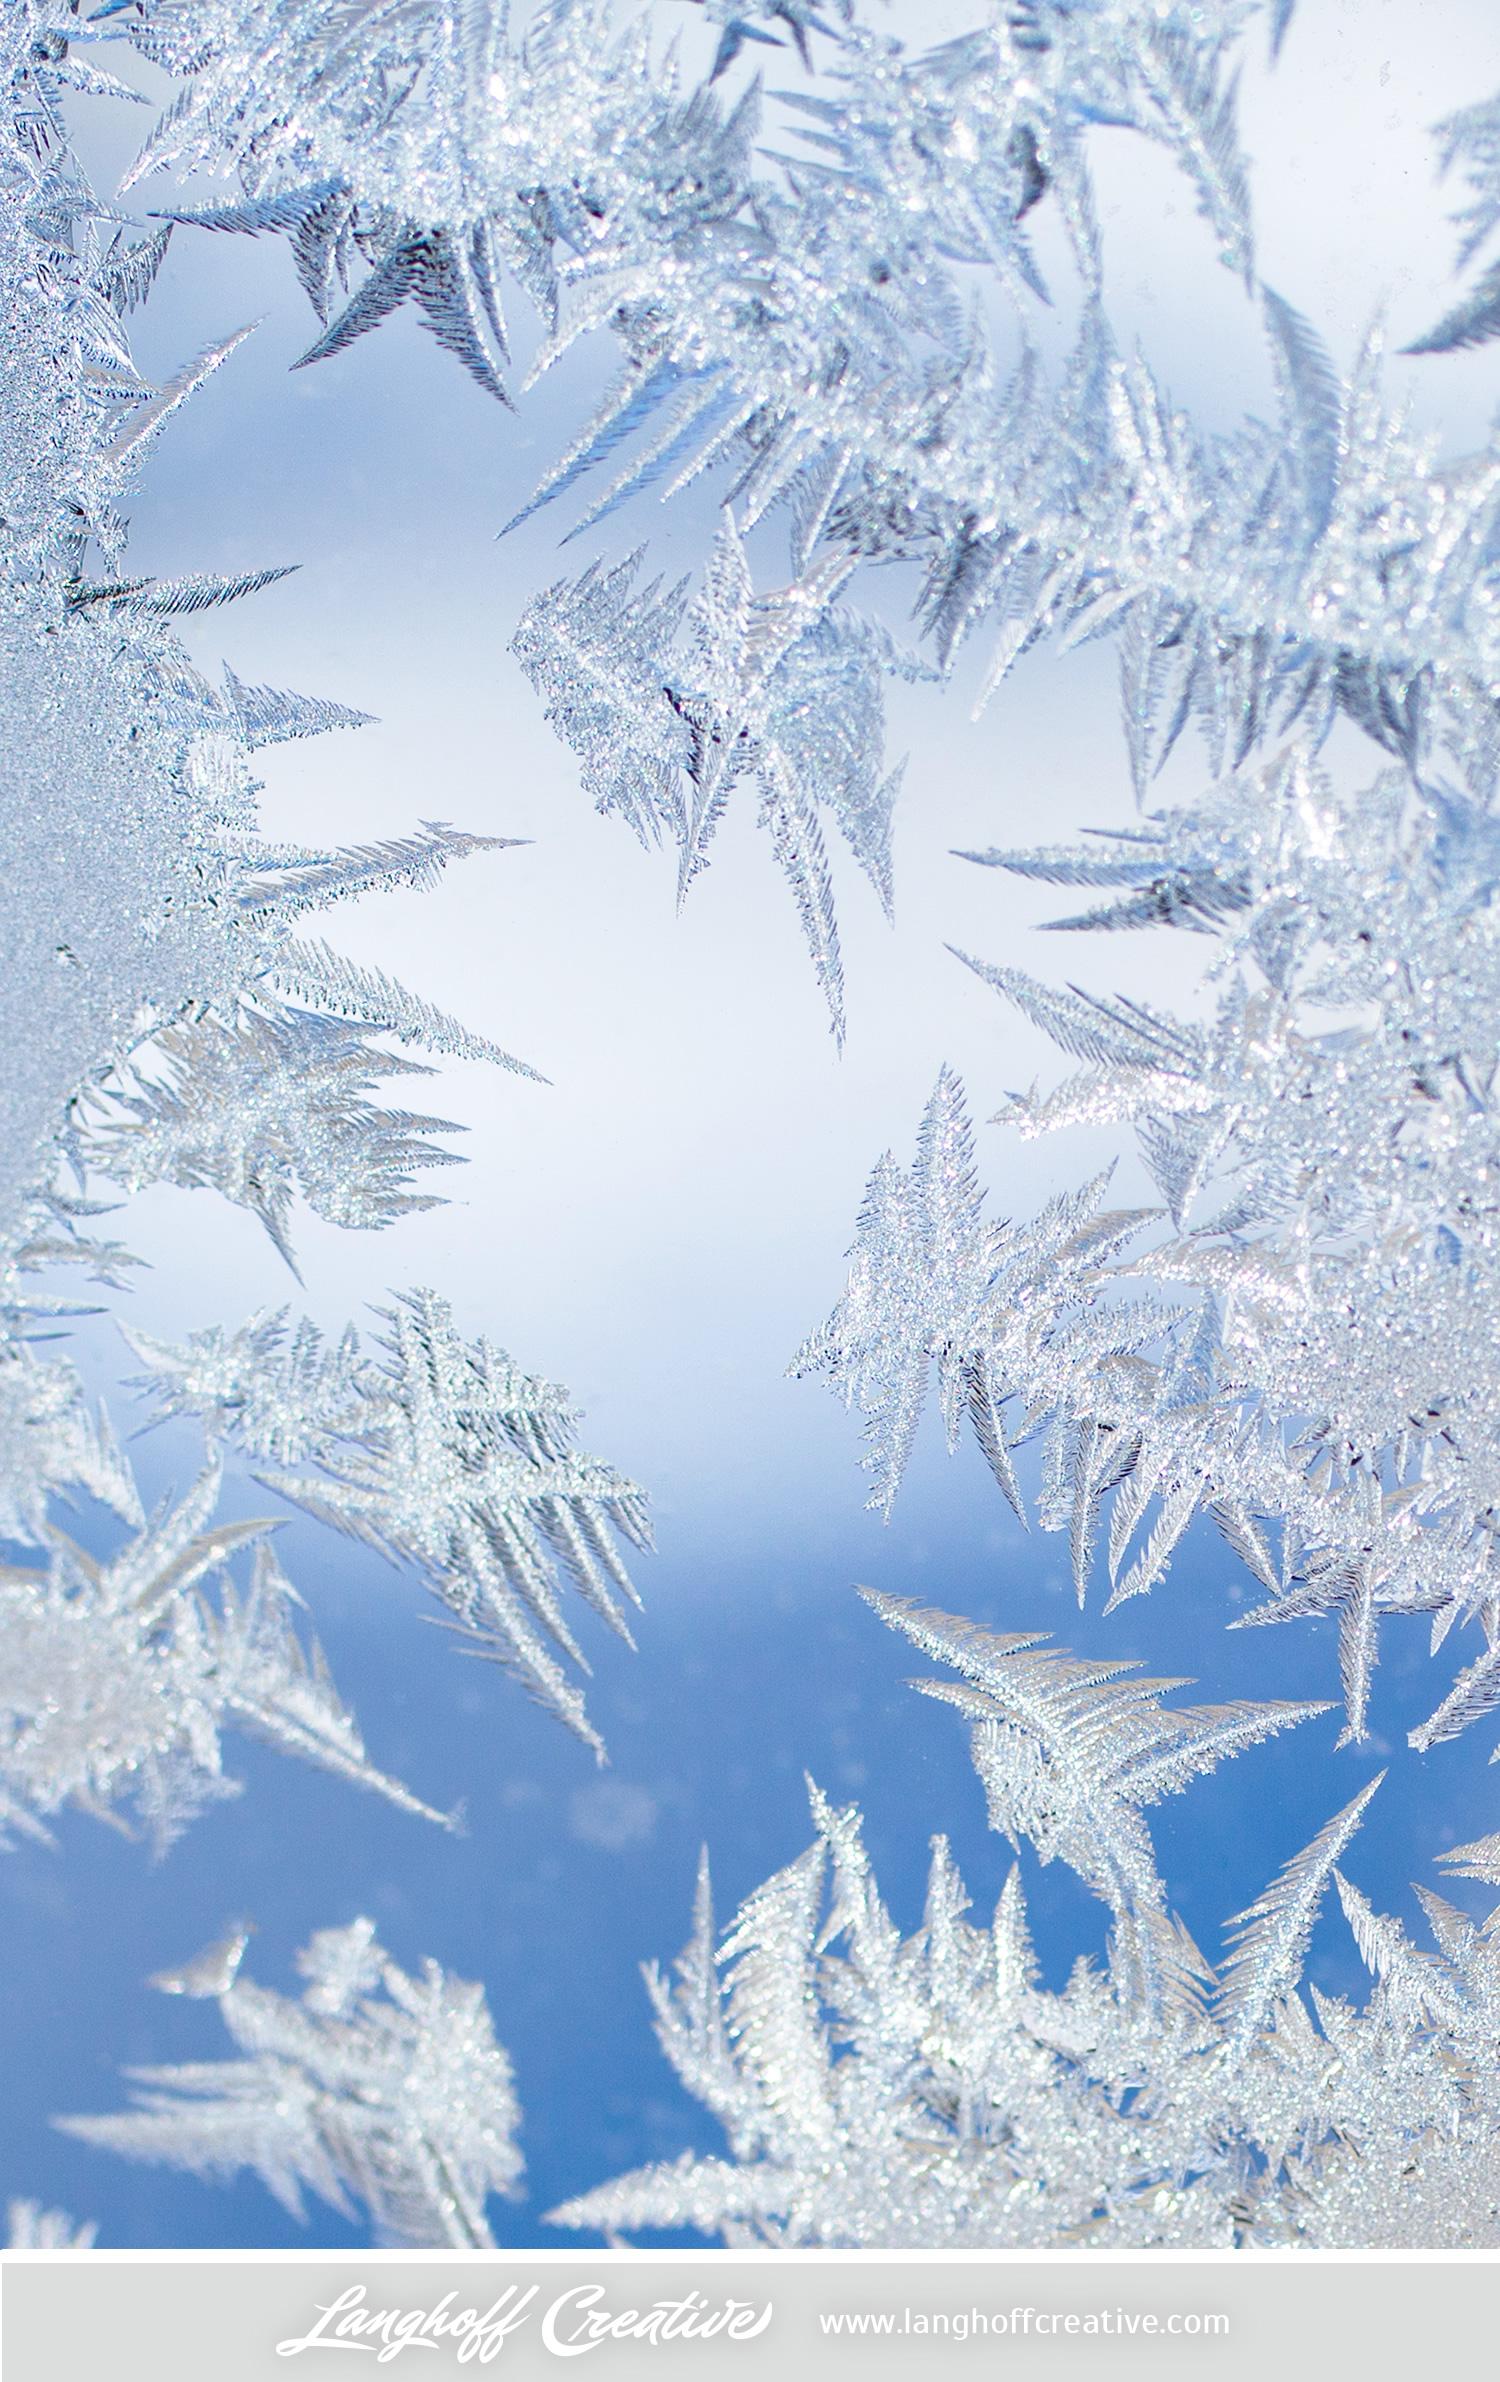 LanghoffCreative-frost-macro-photography_Jan06-2014-photo-11.jpg